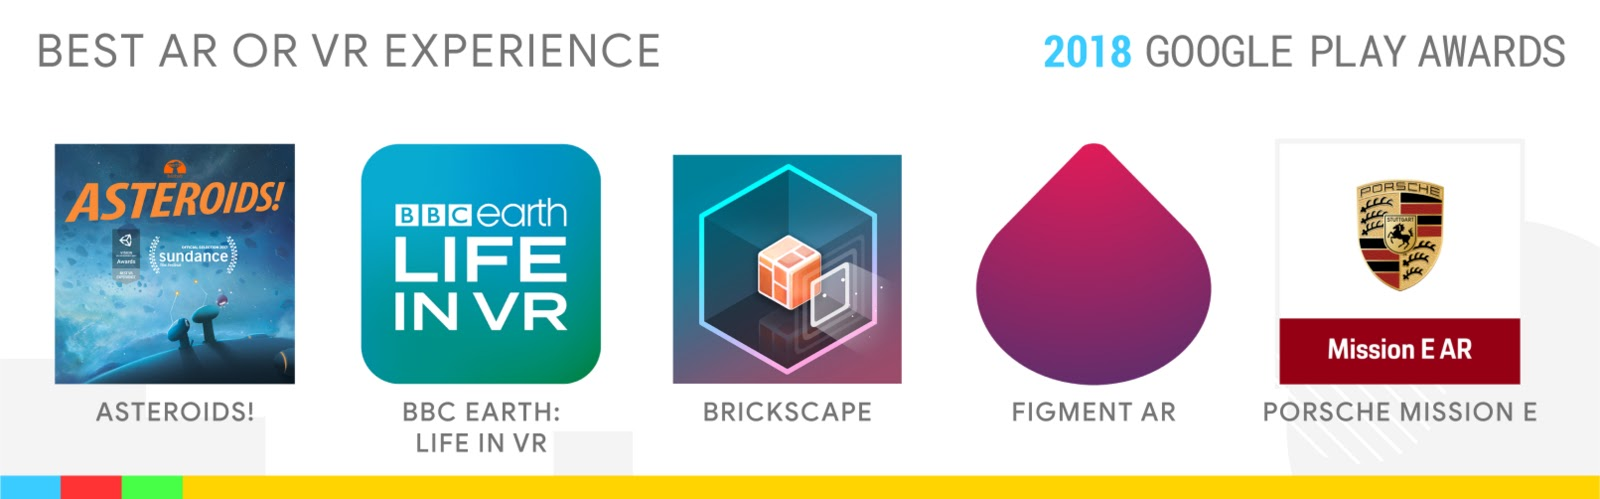 Best AR or VR Experience: ASTEROIDS!, BBC Earth: Life in VR, Brickscape, Figment AR, Porsche Mission E